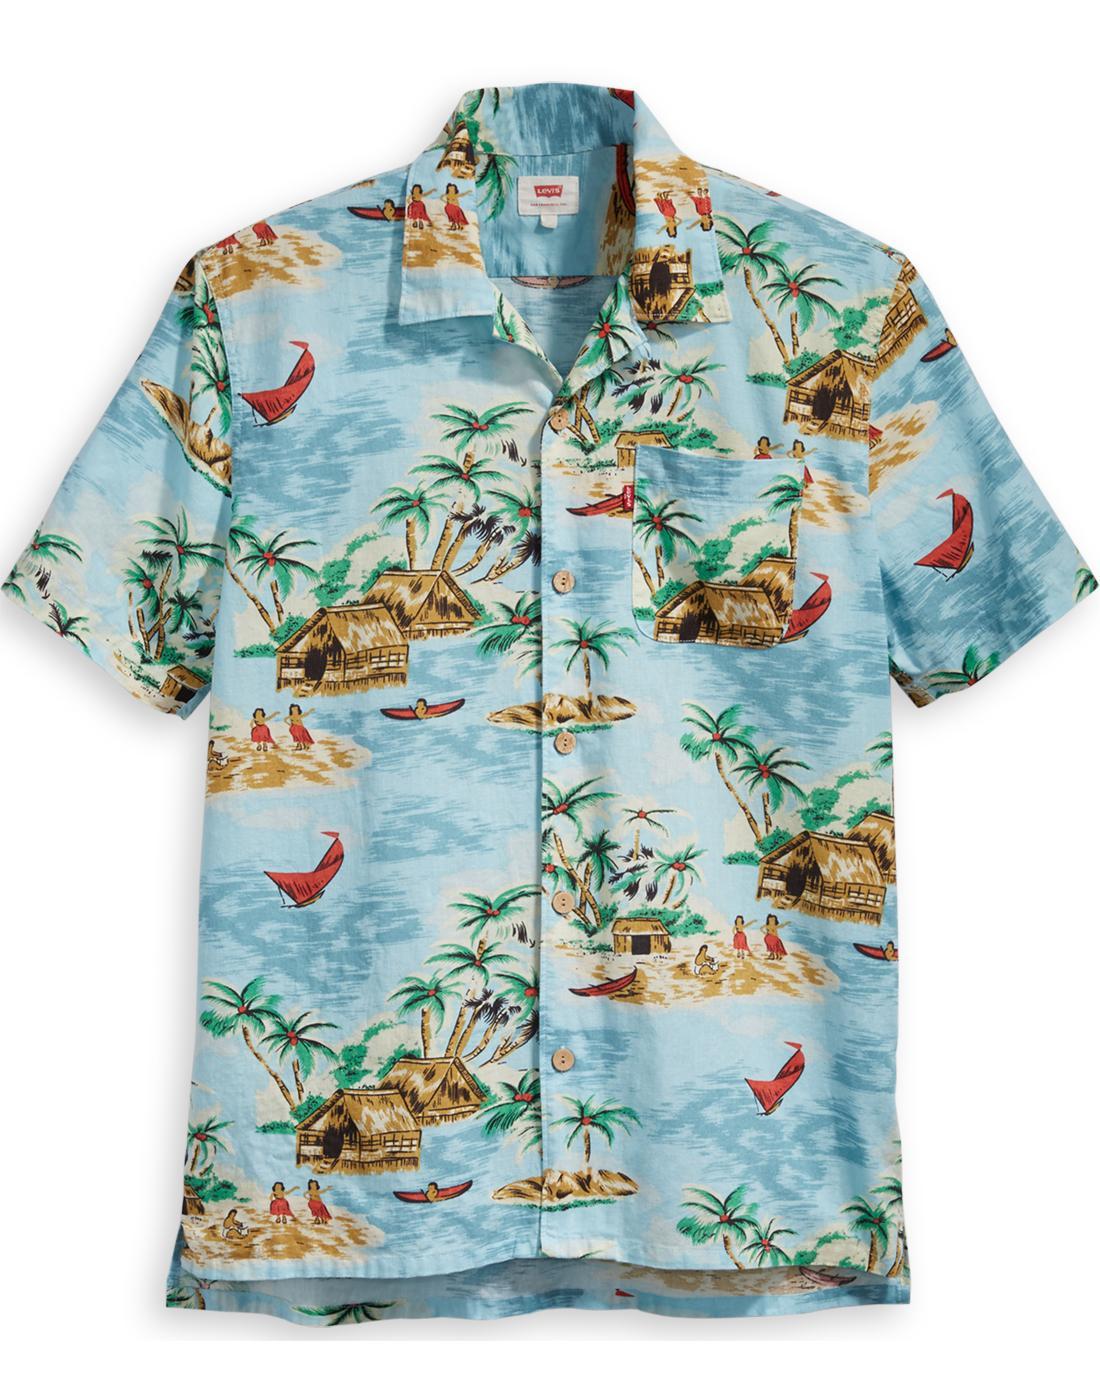 LEVI'S Mens Retro 1950s Resort Hawaiian Shirt